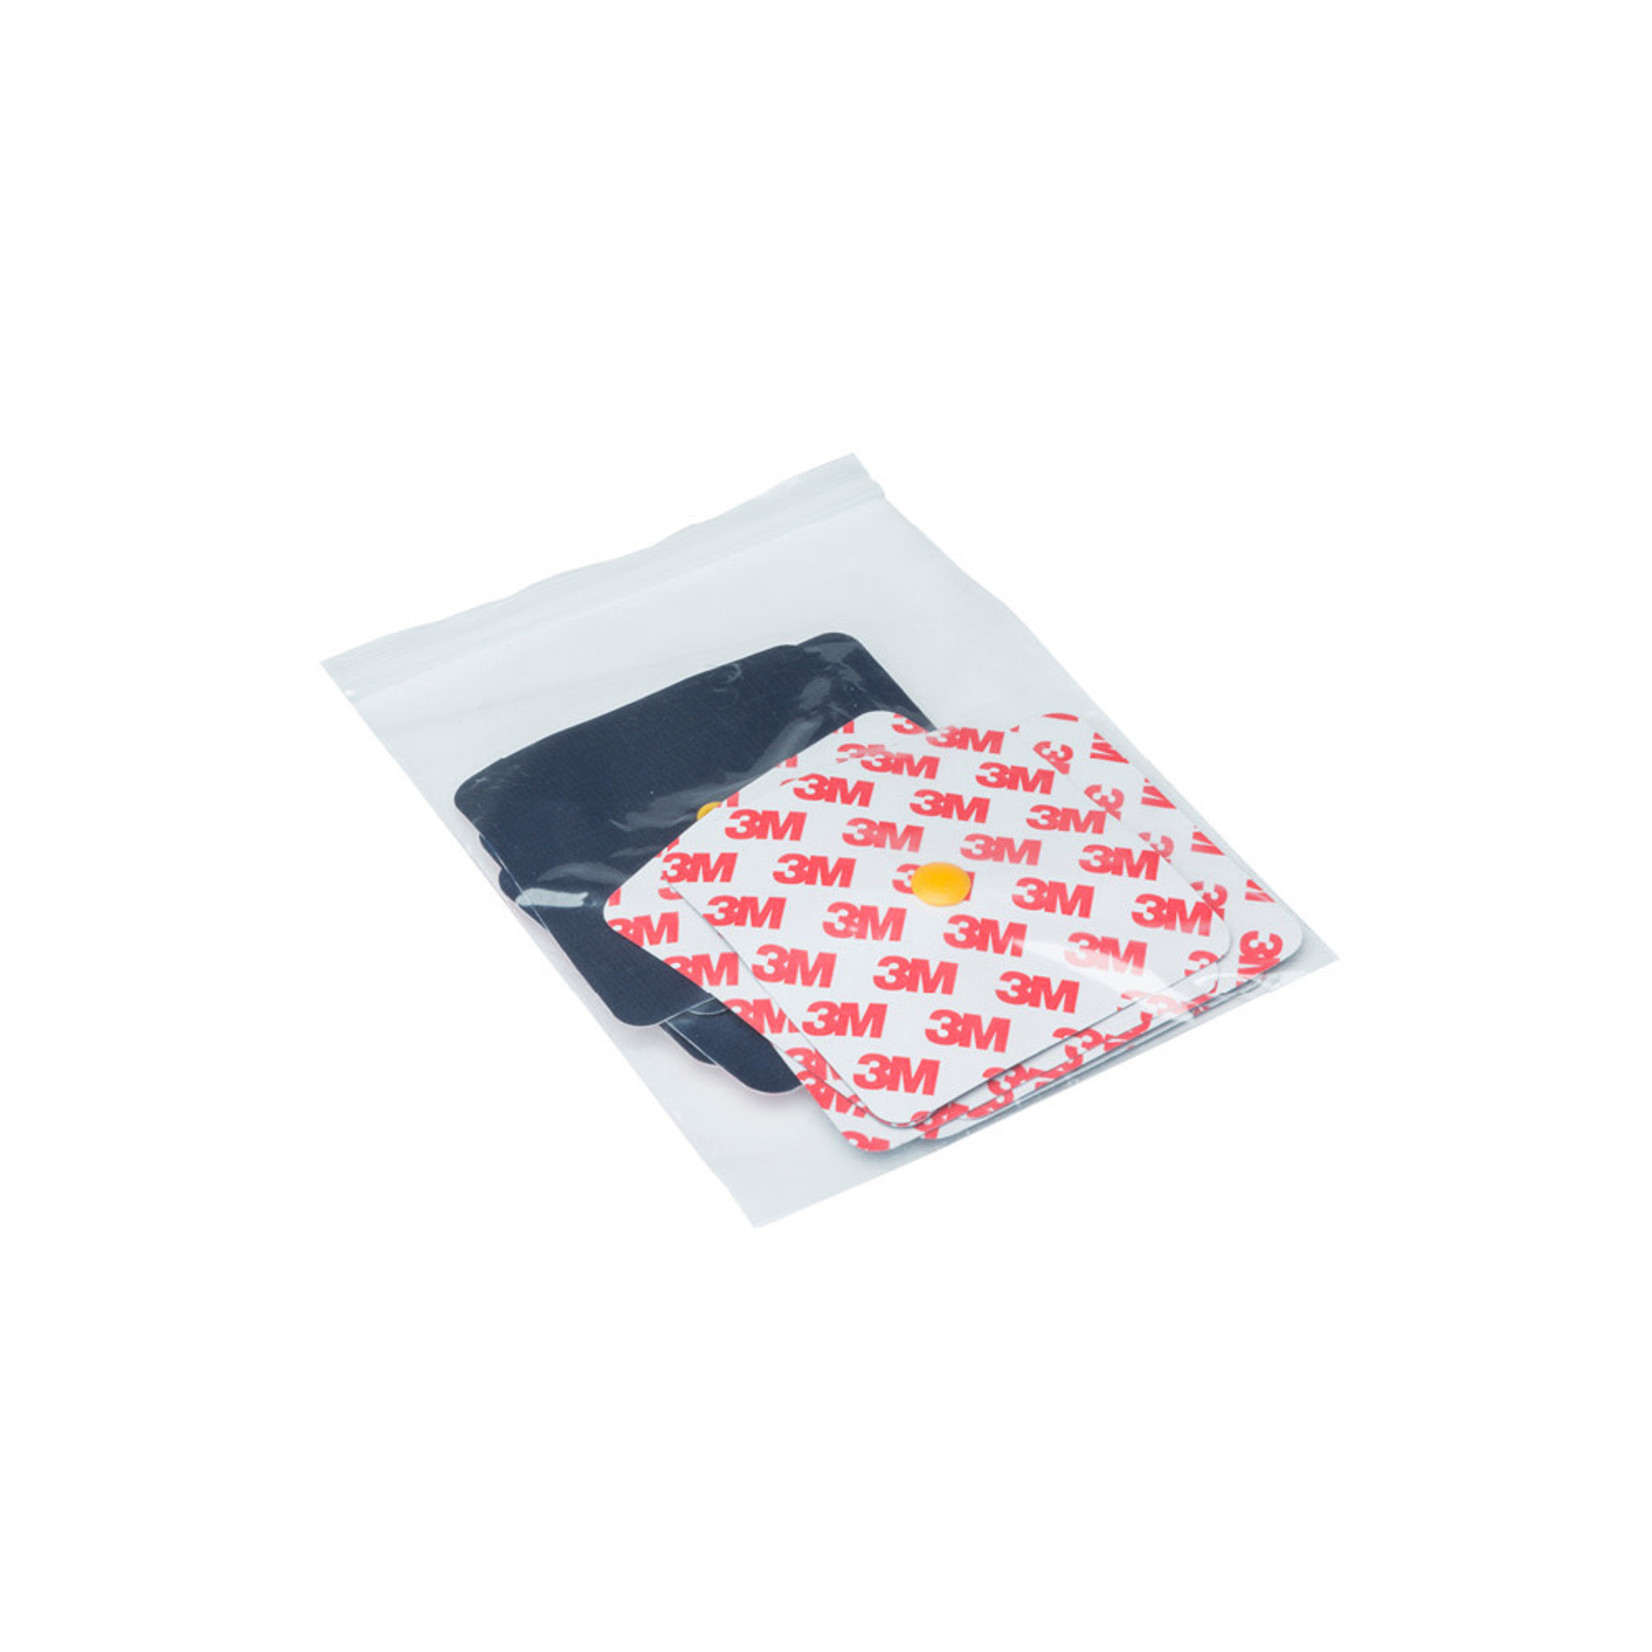 Big Agnes Big Agnes Snap Patch Accessory Pack